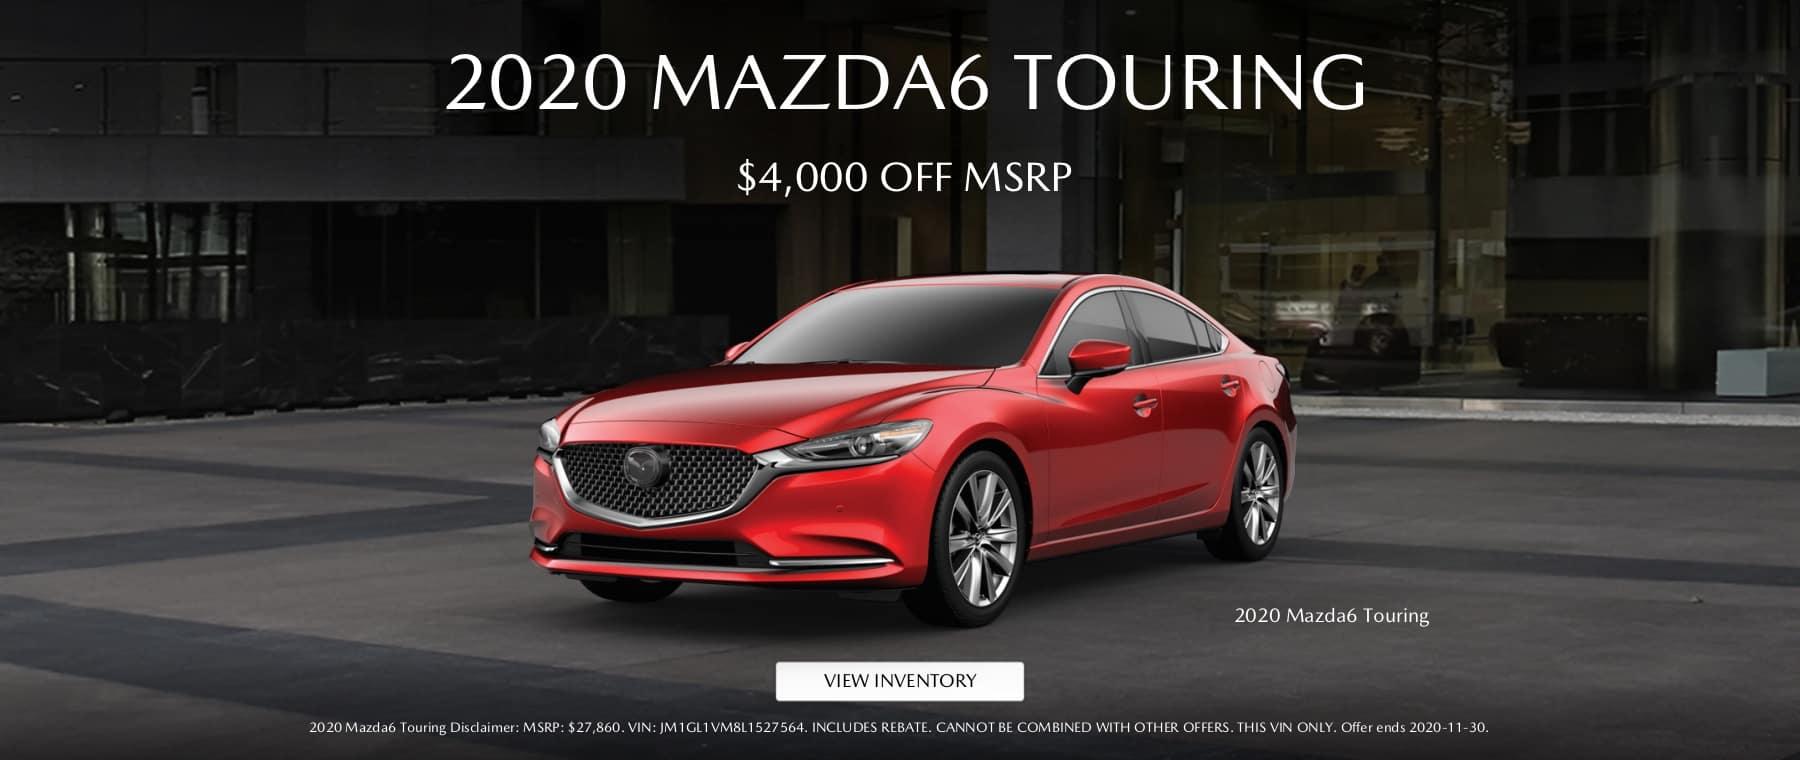 Mazda6 Touring